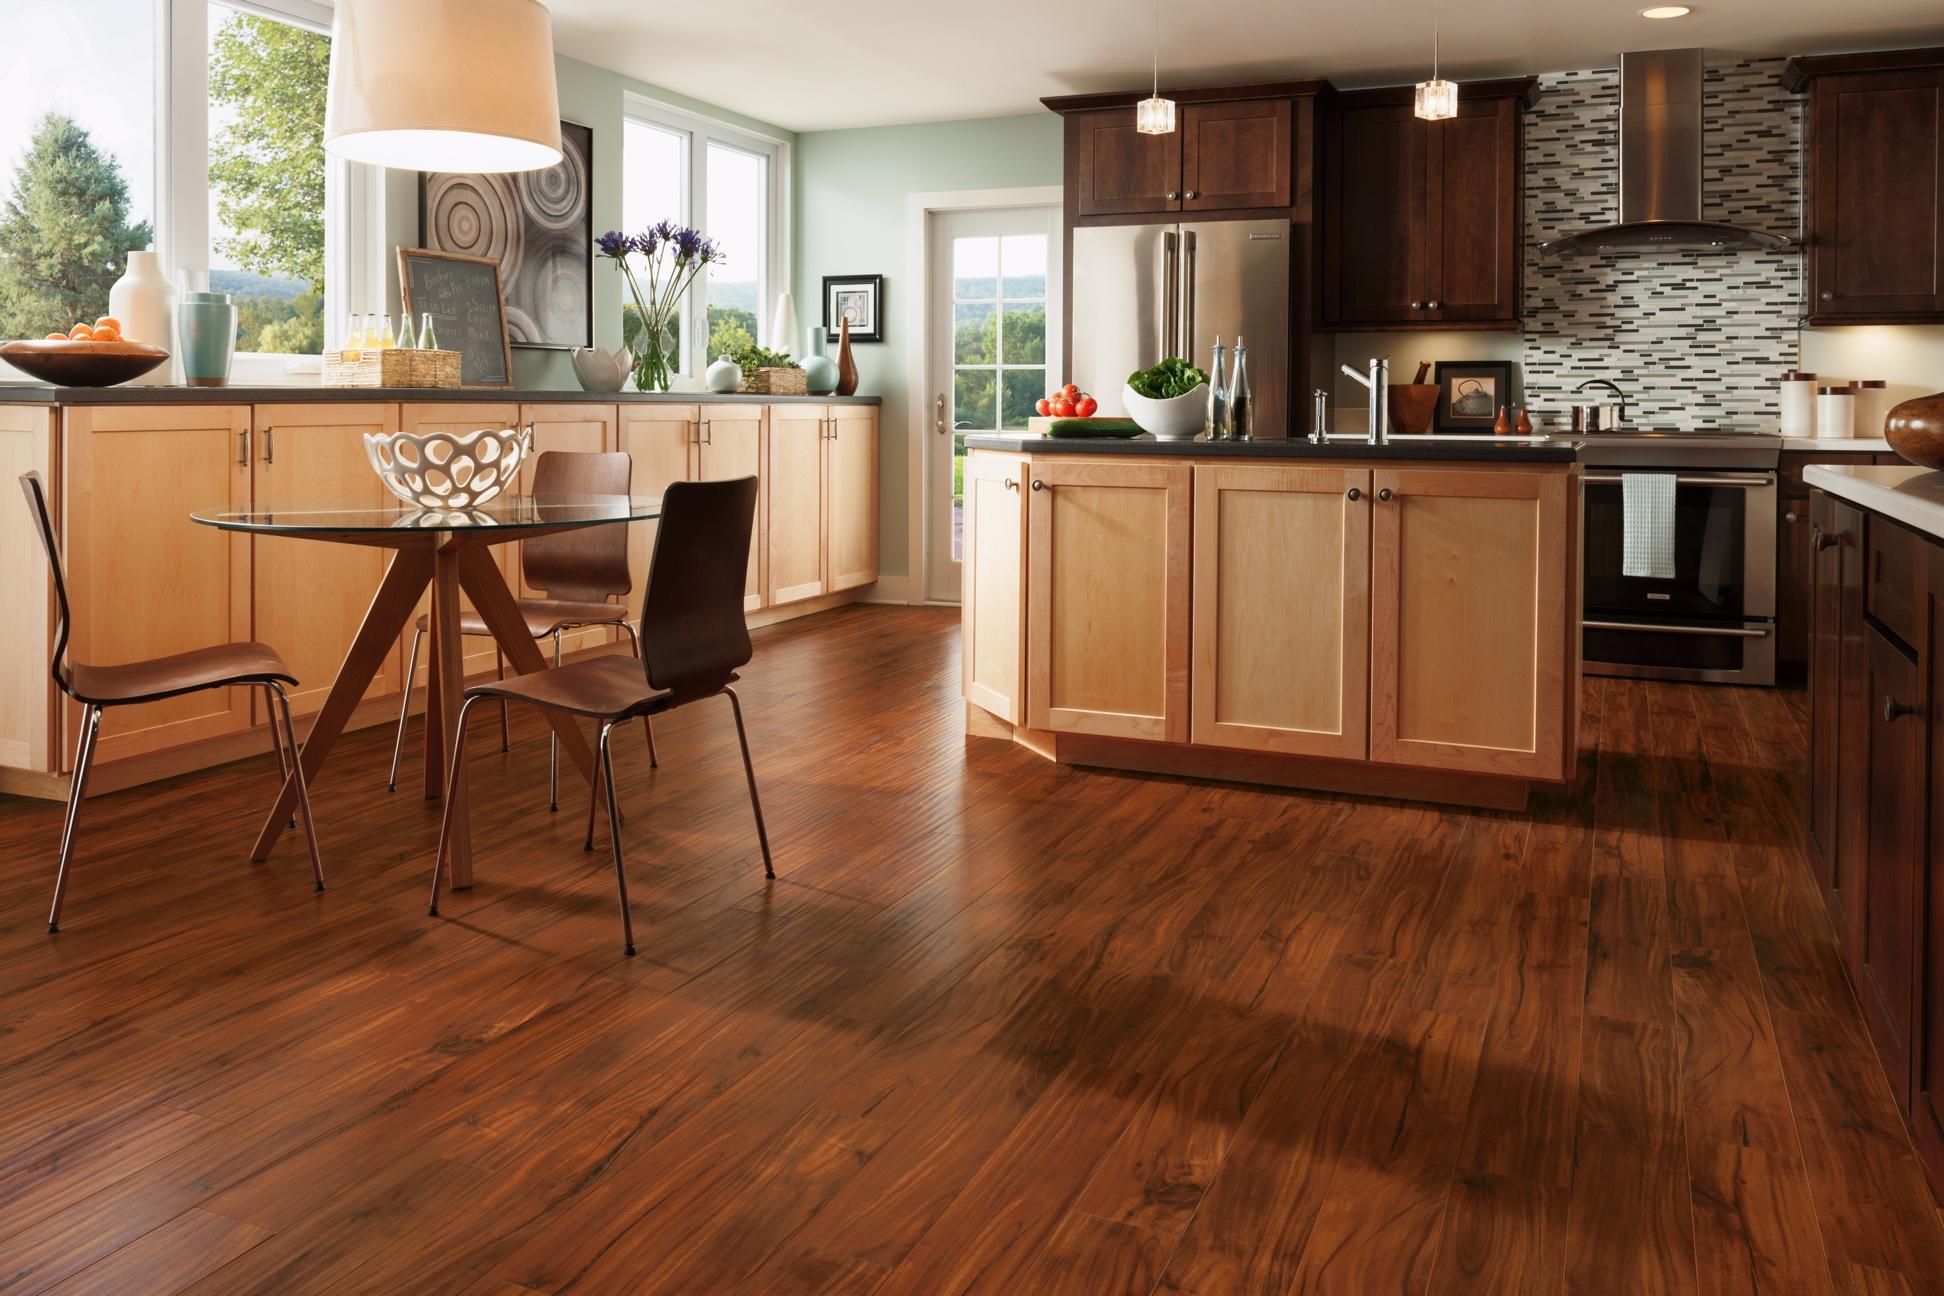 ... Laminate Flooring 02 & Why Laminate Flooring is a Good Option